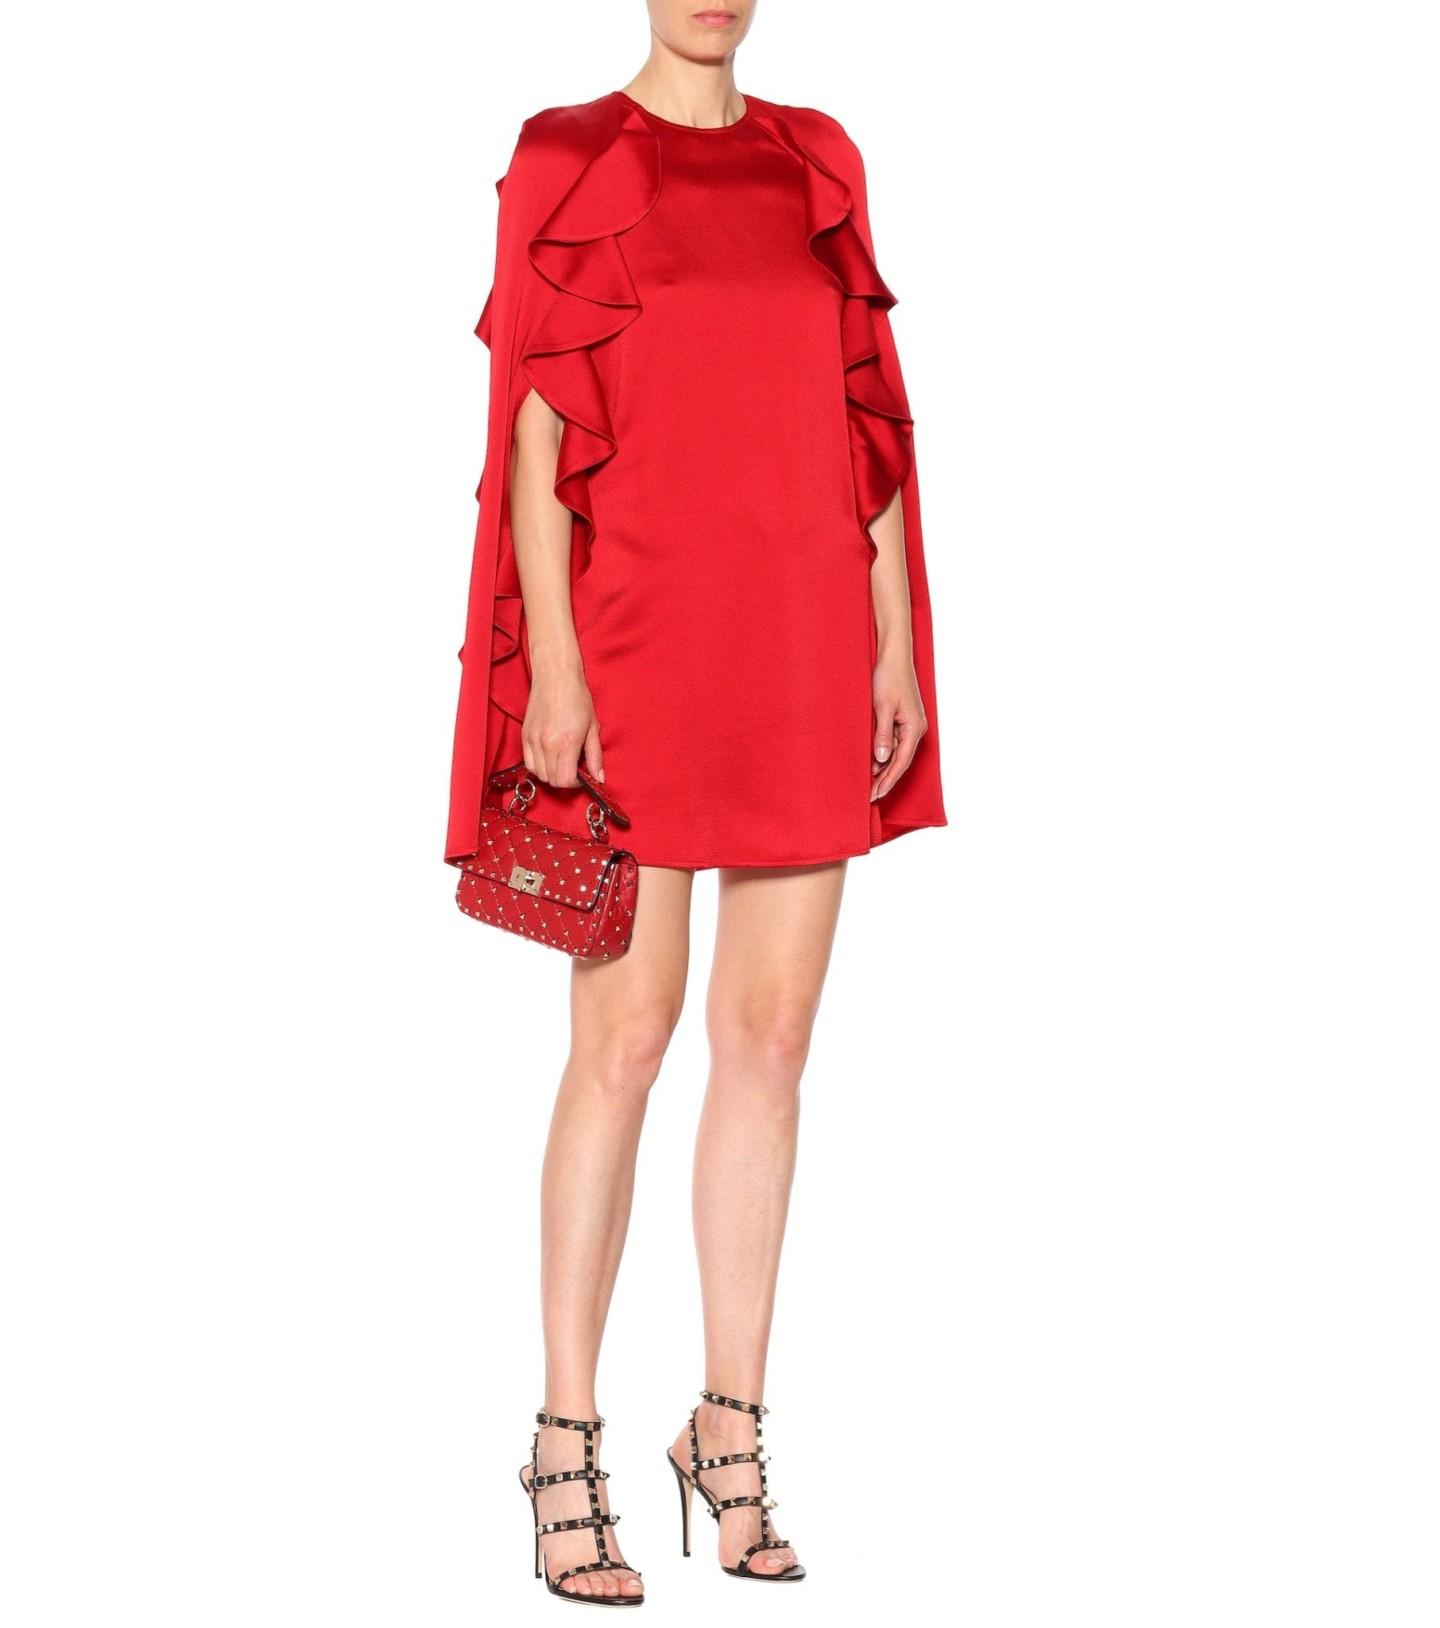 VALENTINO Crêpe Cape Red Dress